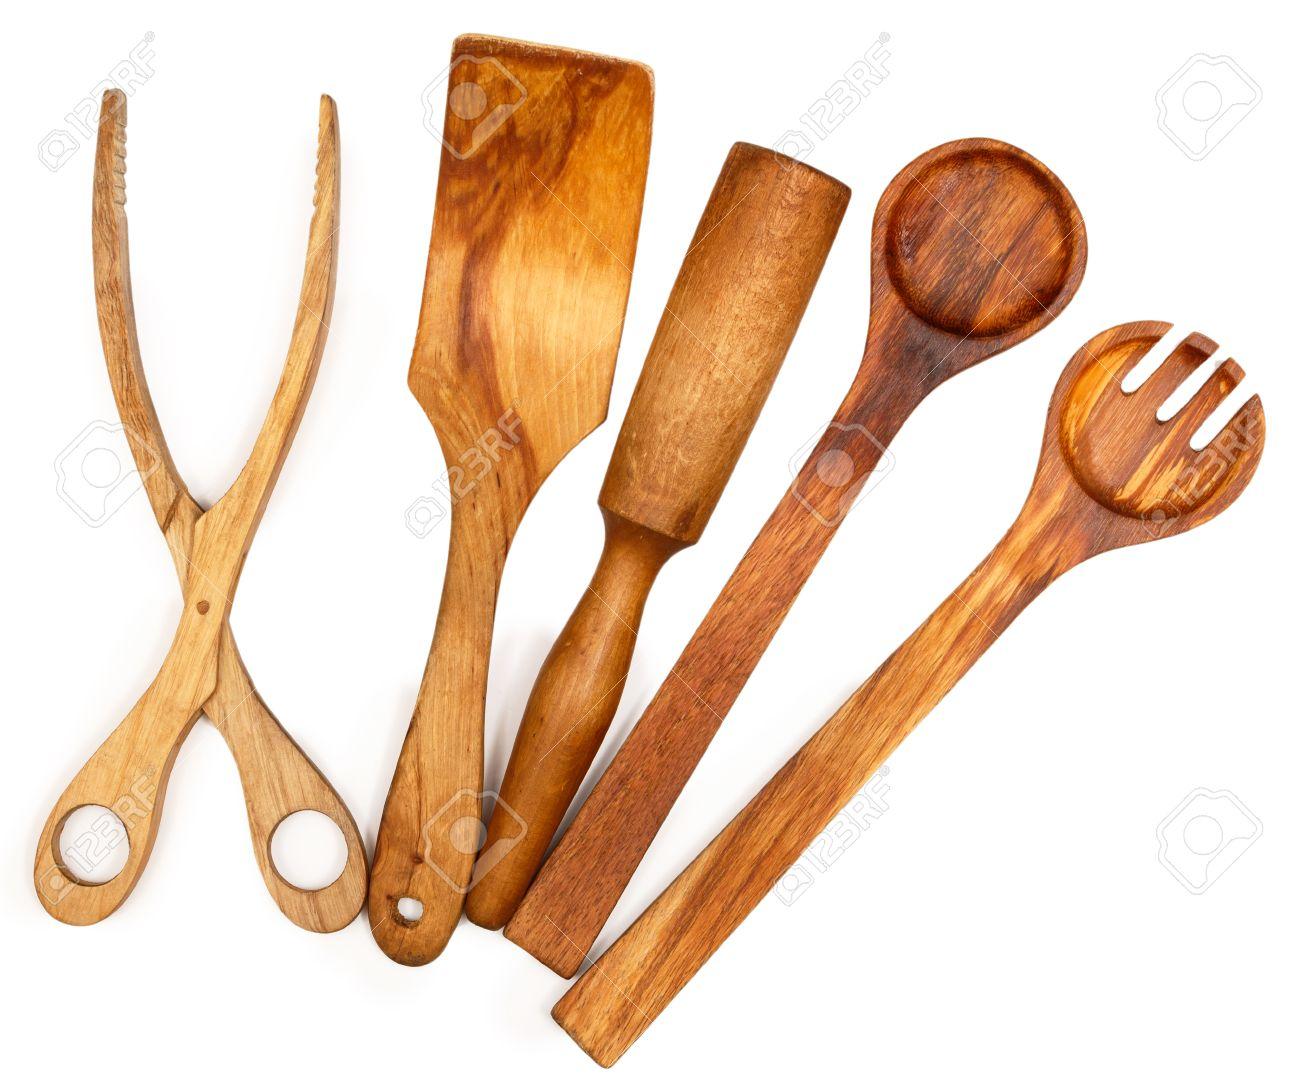 utensili da cucina in legno su sfondo bianco foto royalty free ... - Arnesi Da Cucina